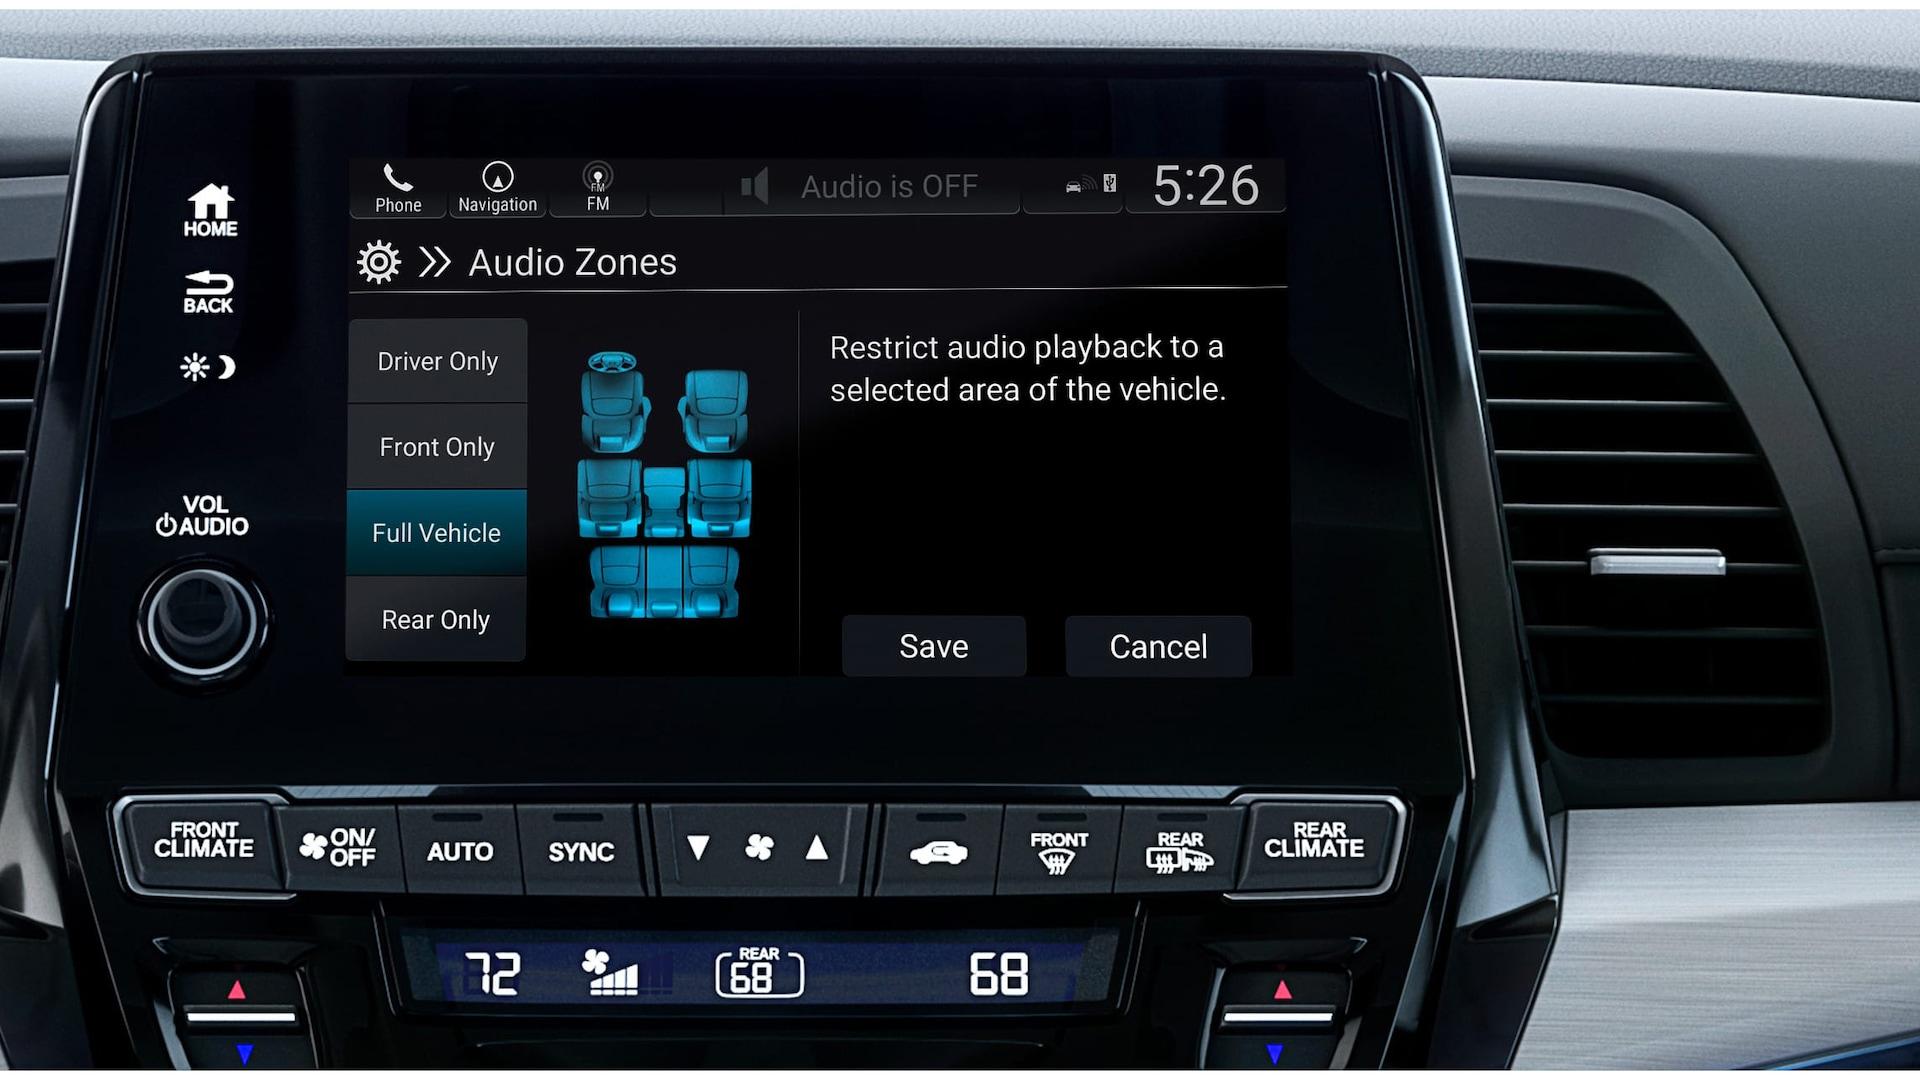 Detalle de audio multi-zone en la pantalla táctil del sistema de audio en la Honda Odyssey Elite 2020 con Gray Leather.